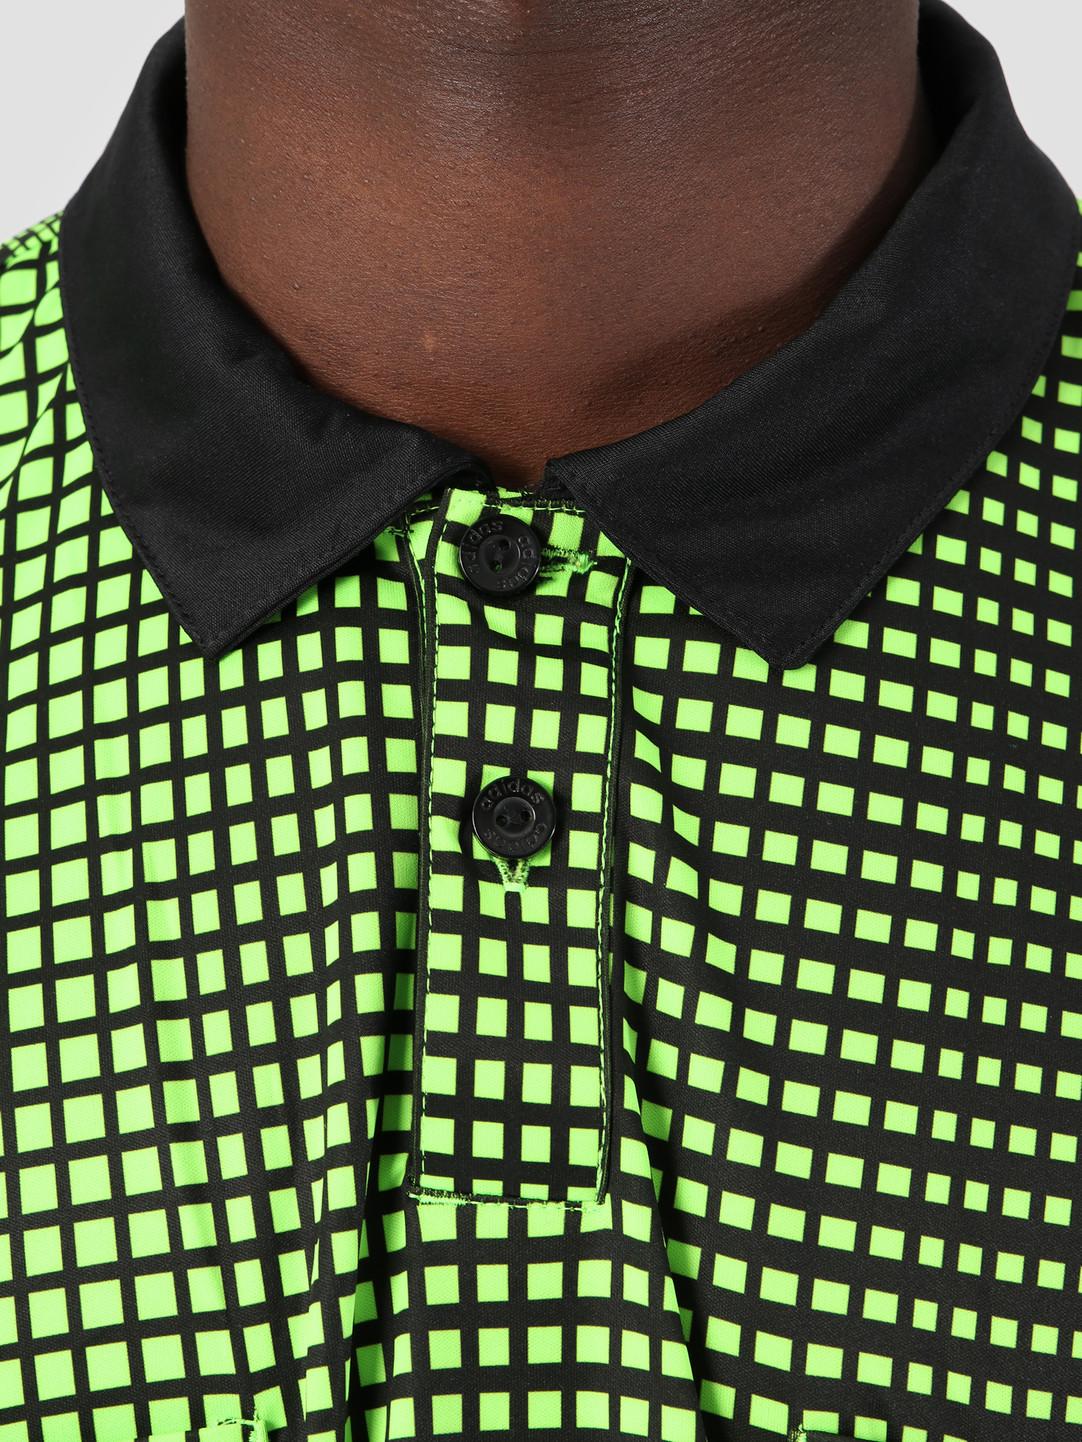 adidas adidas Ref Jersey Longsleeve Black DU8207